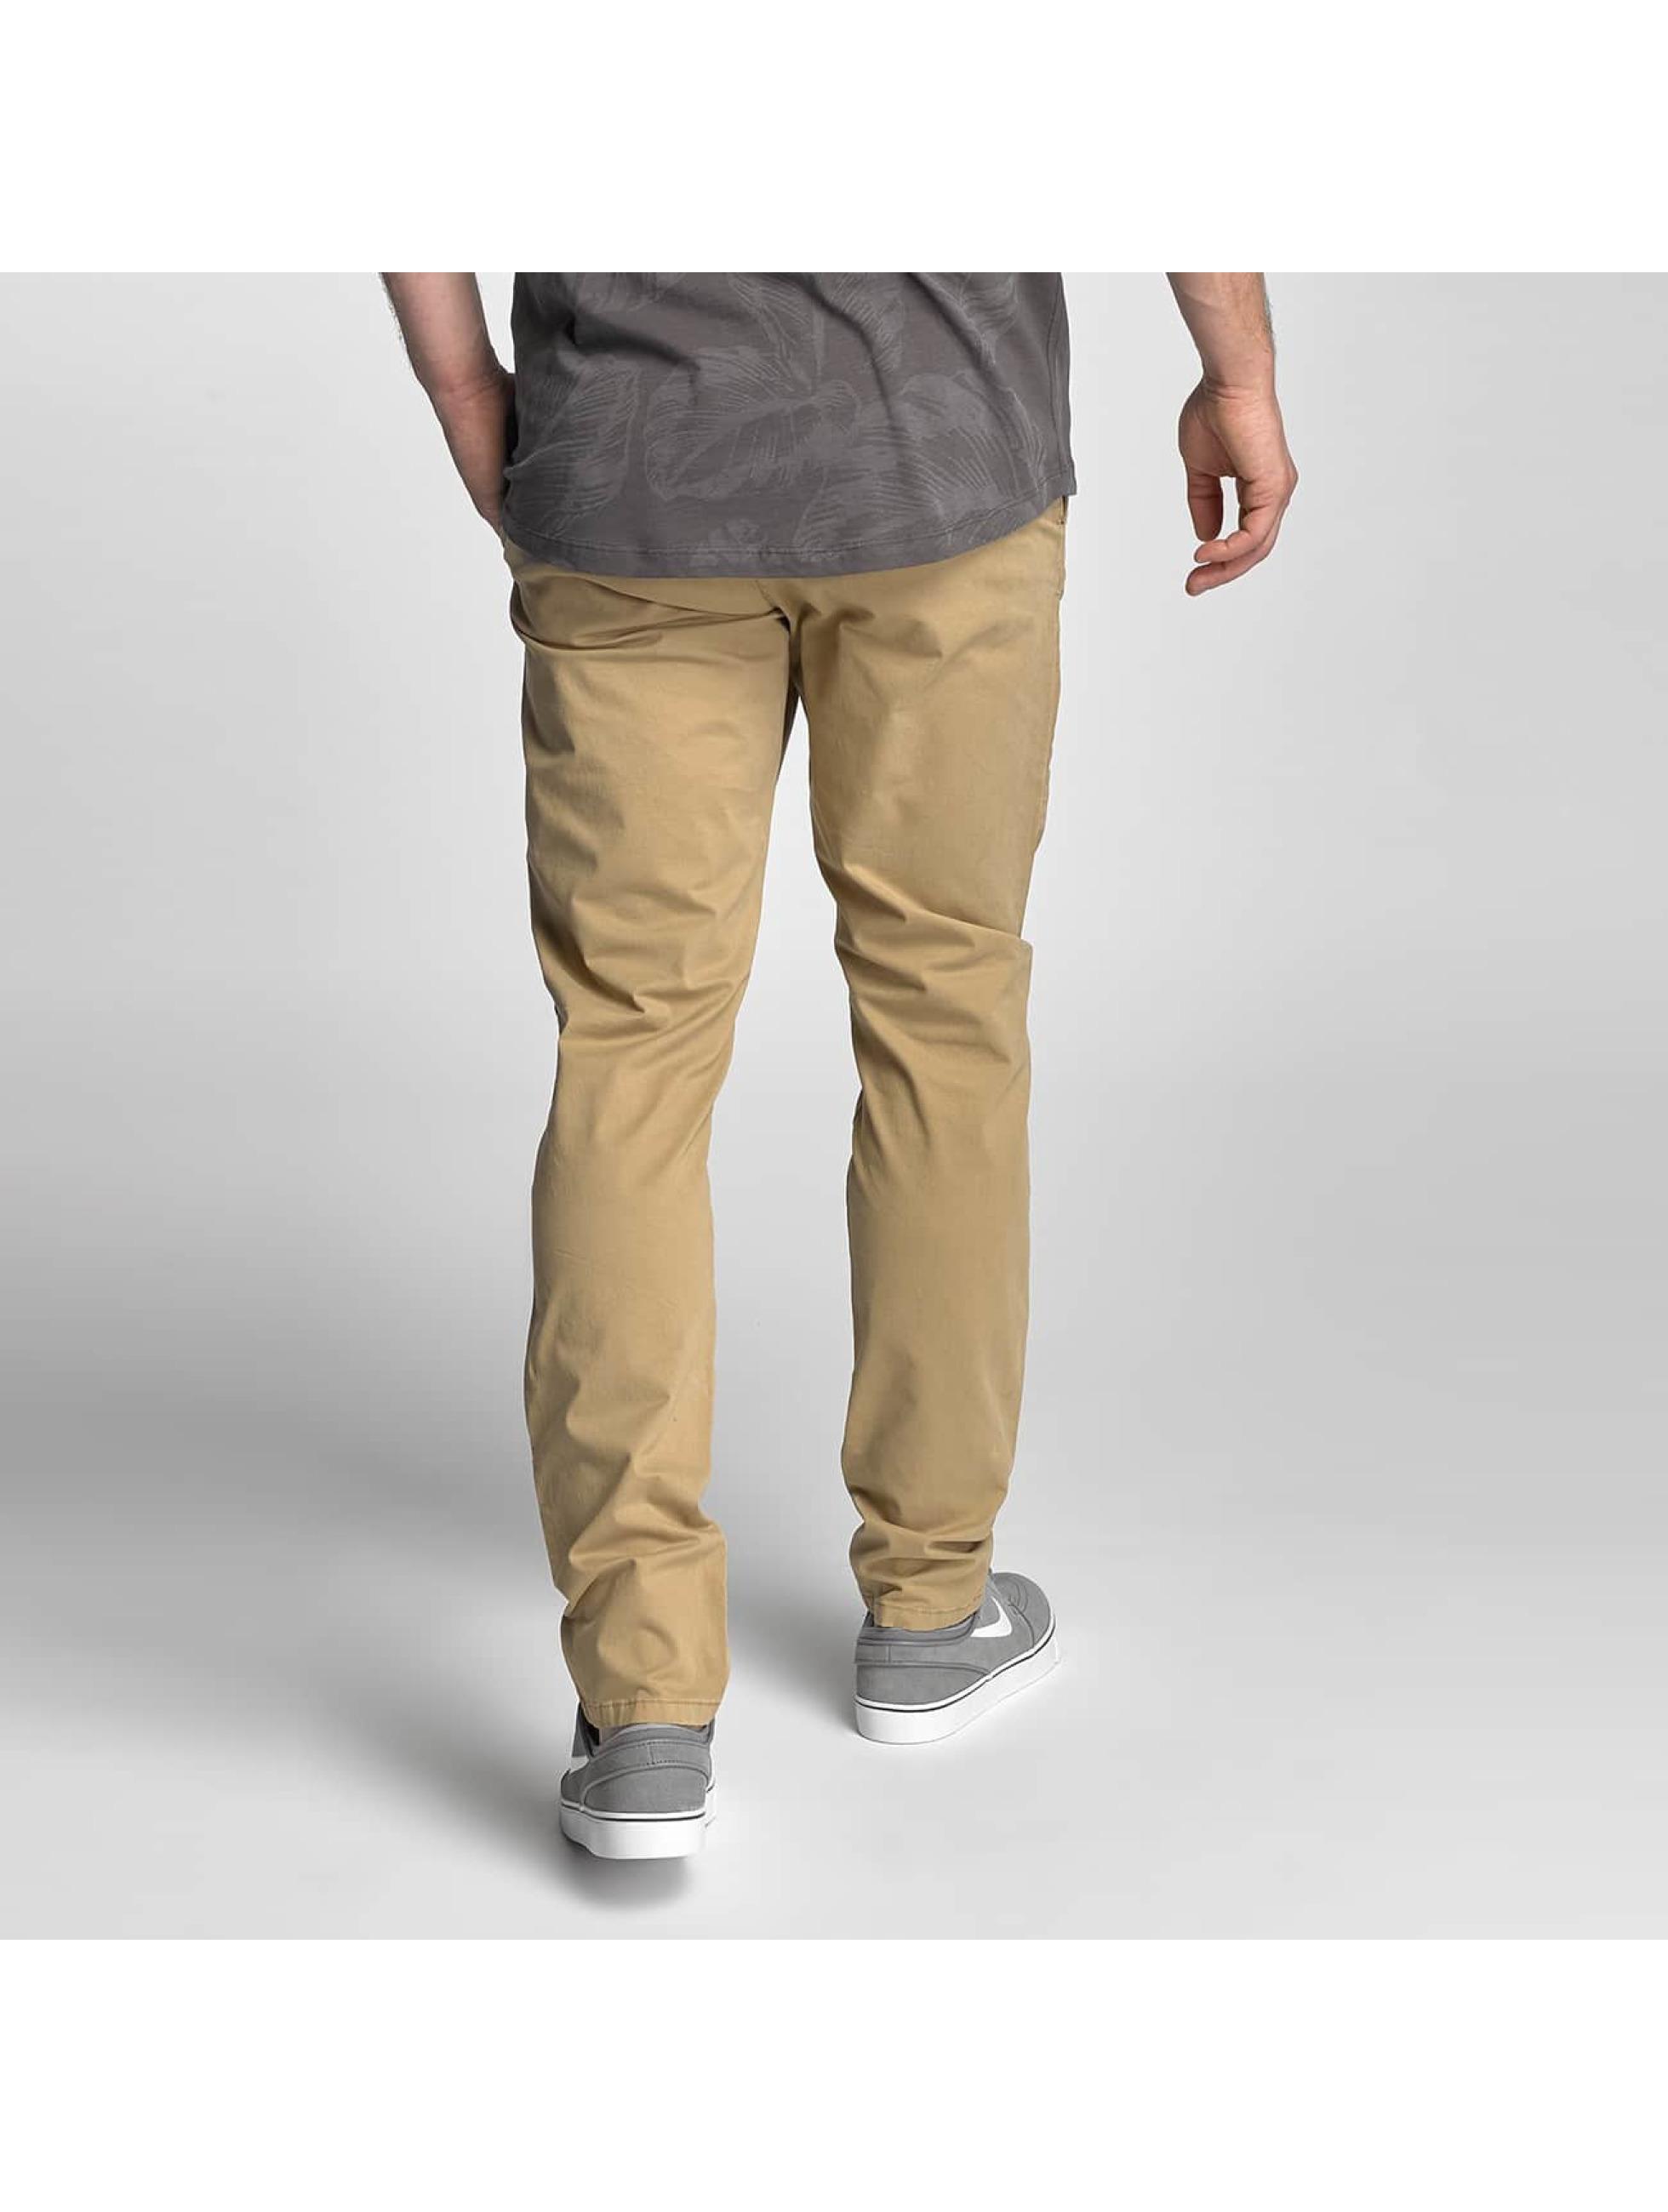 jack jones jjimarco jjearl brun homme pantalon chino. Black Bedroom Furniture Sets. Home Design Ideas